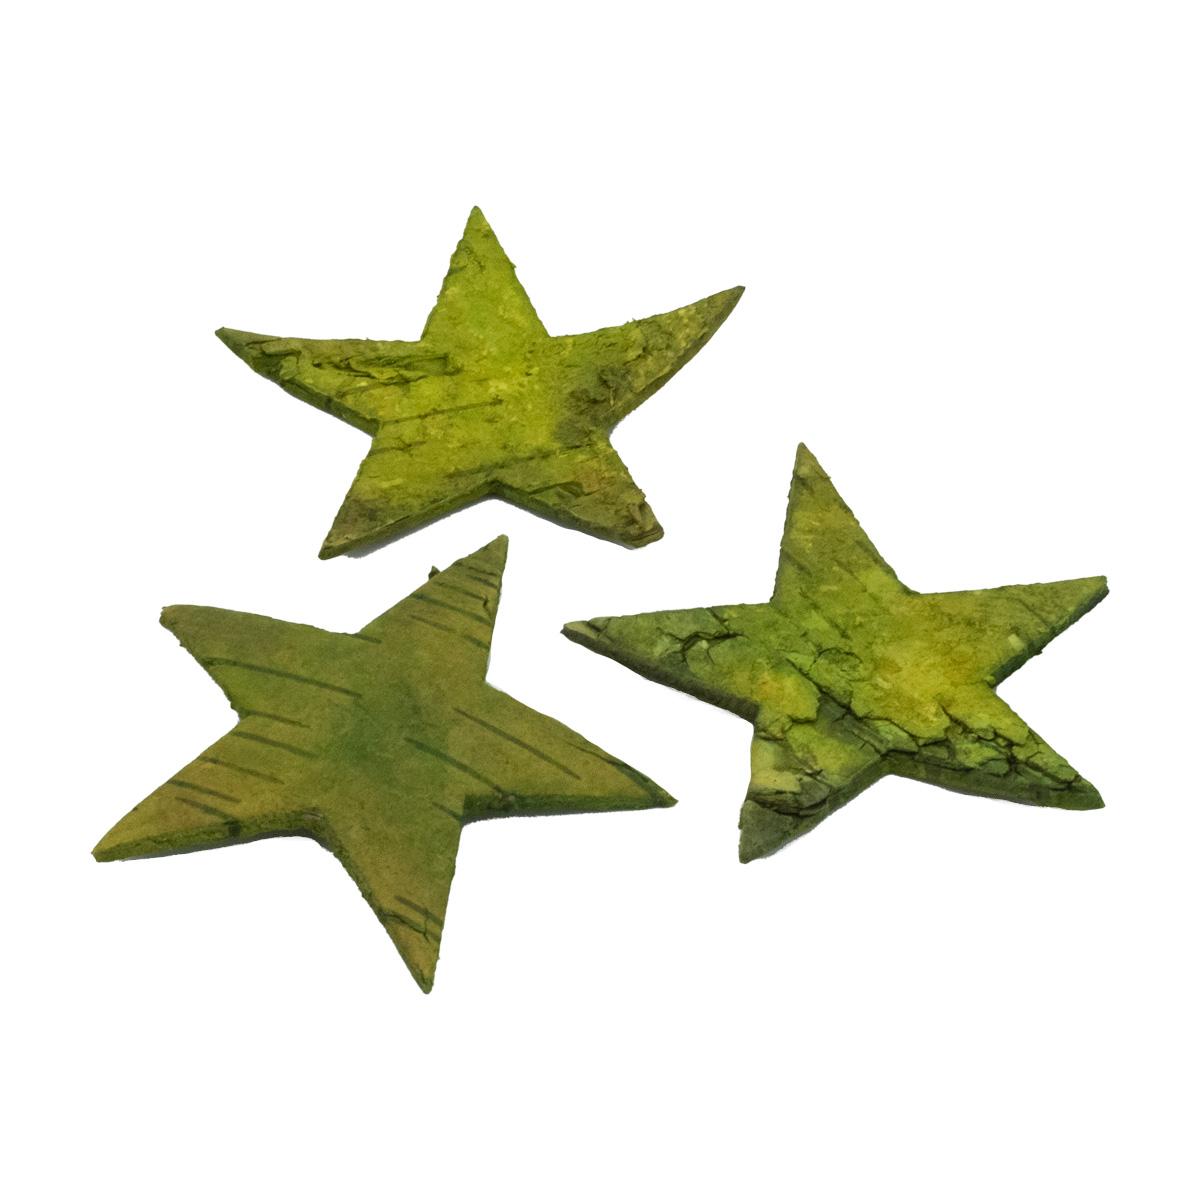 YW186 Декоративные элементы из коры дерева 'Звезда', 7см, 12шт/уп